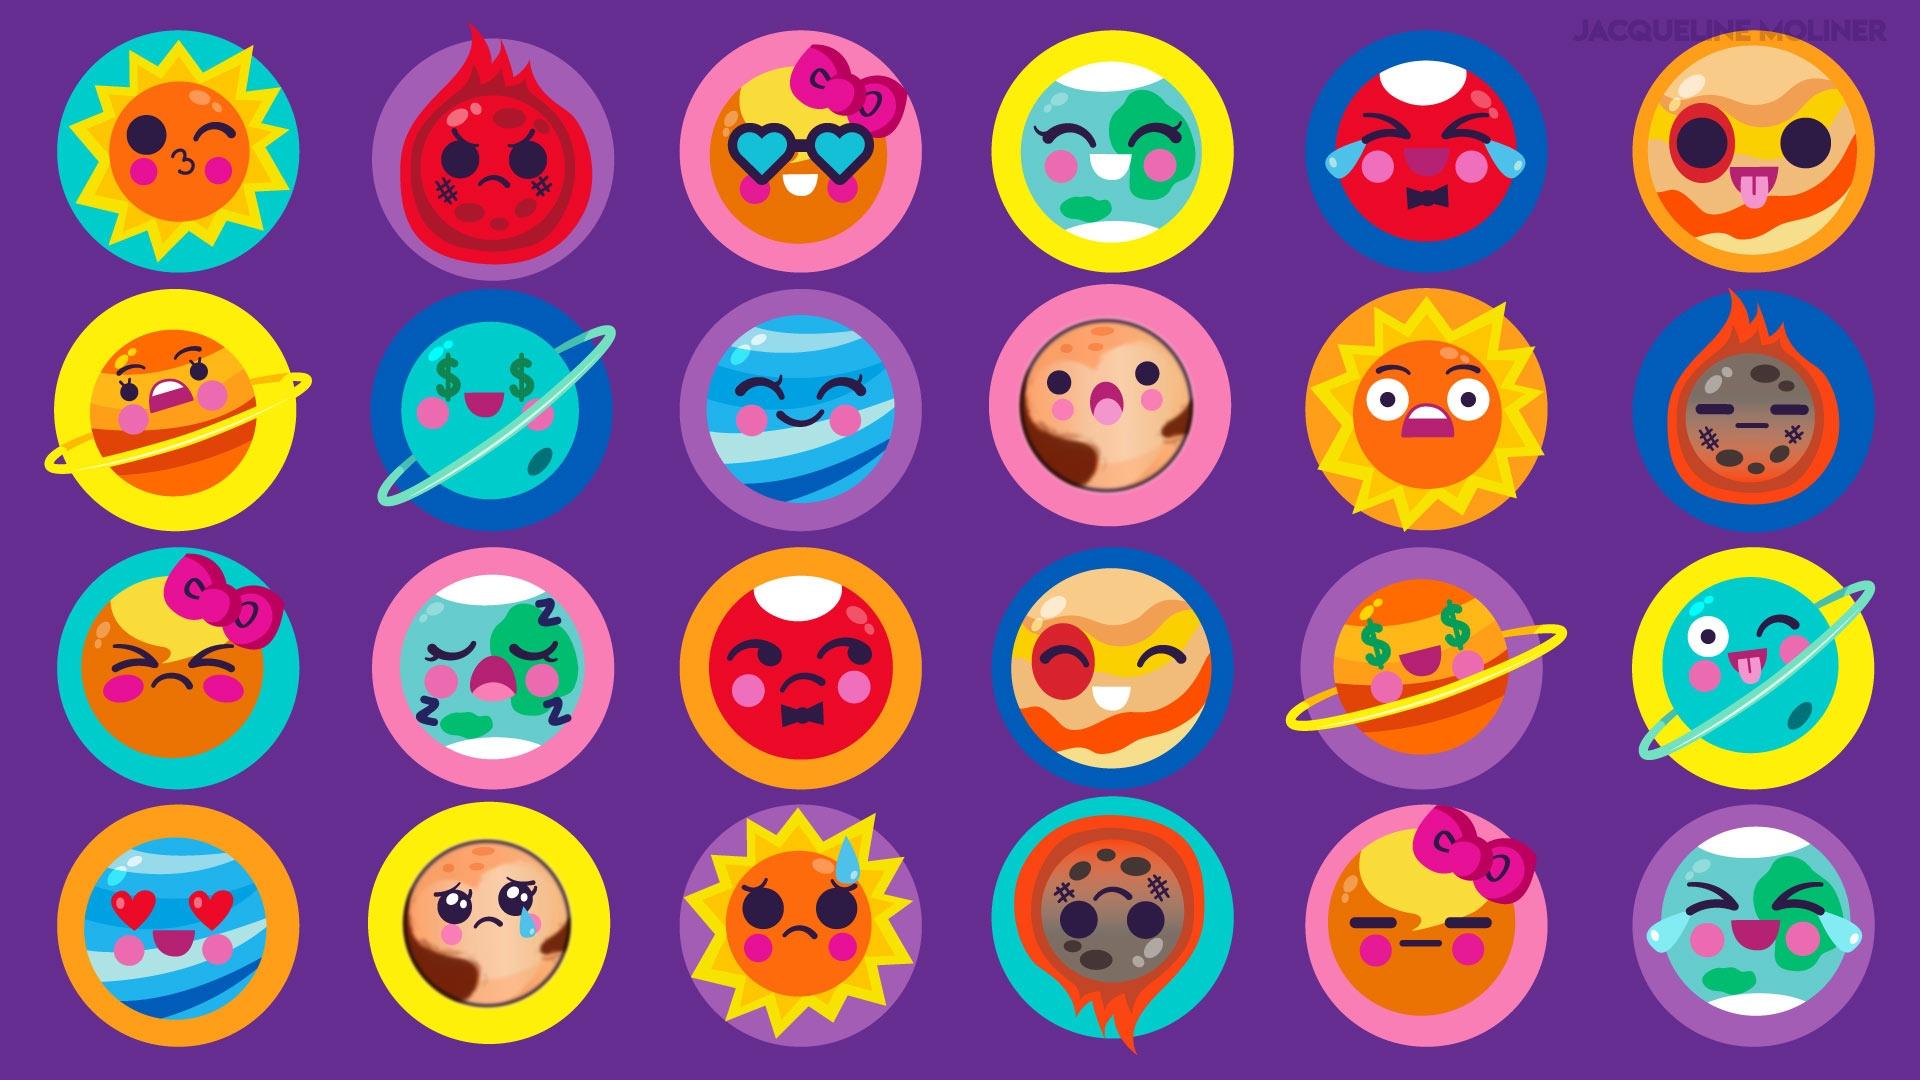 Starry Emojis Wallpaper